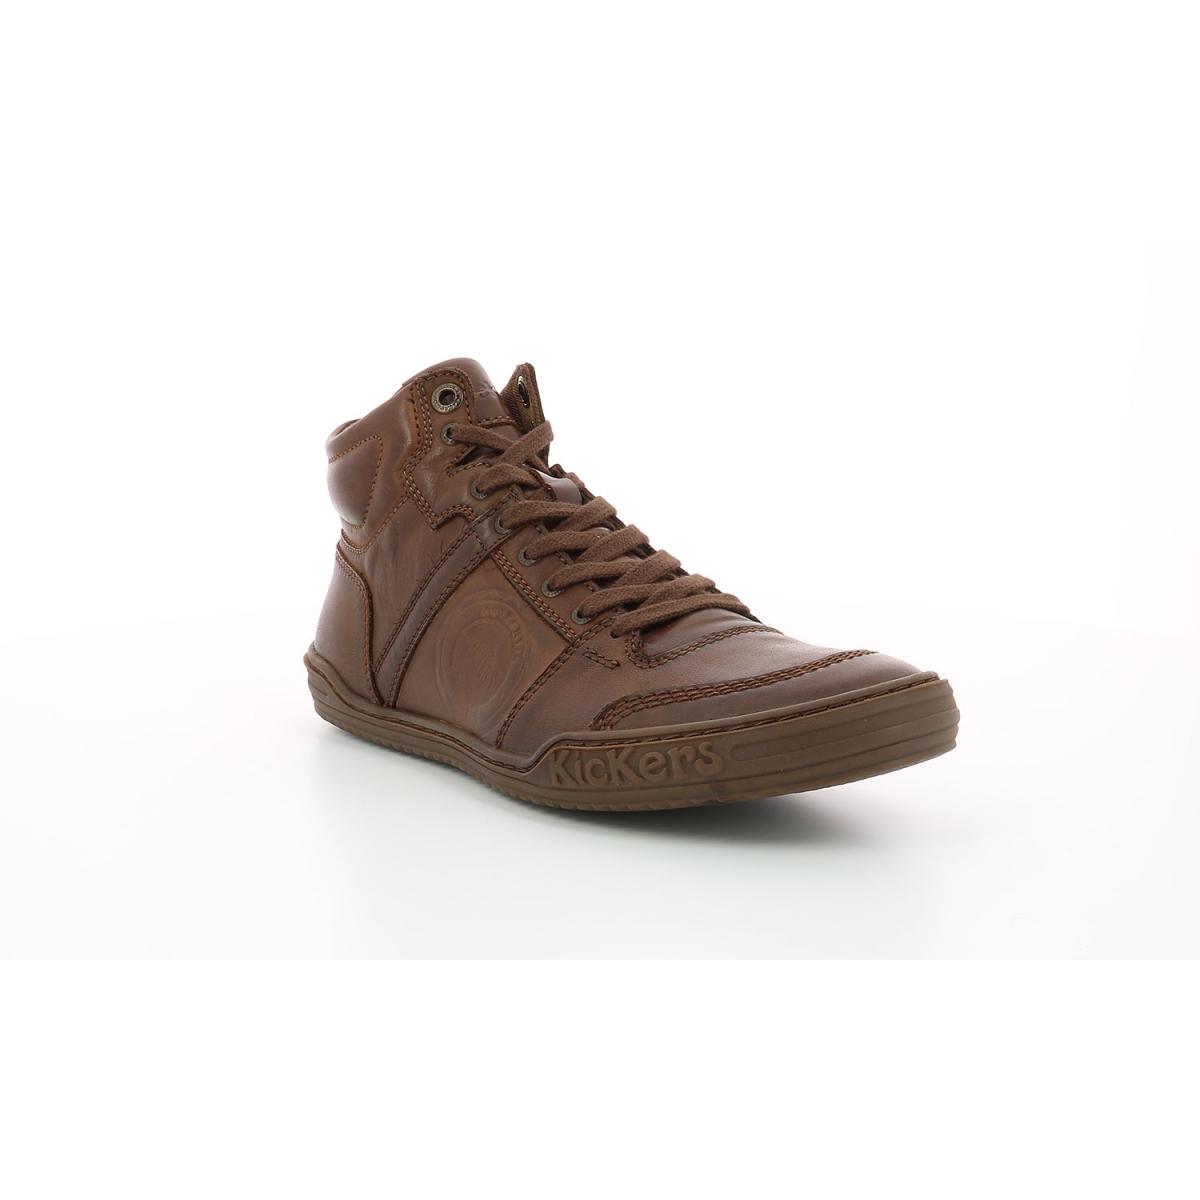 Sneakers Hautes Homme Jexplorehigh Chaussures Homme Kickers